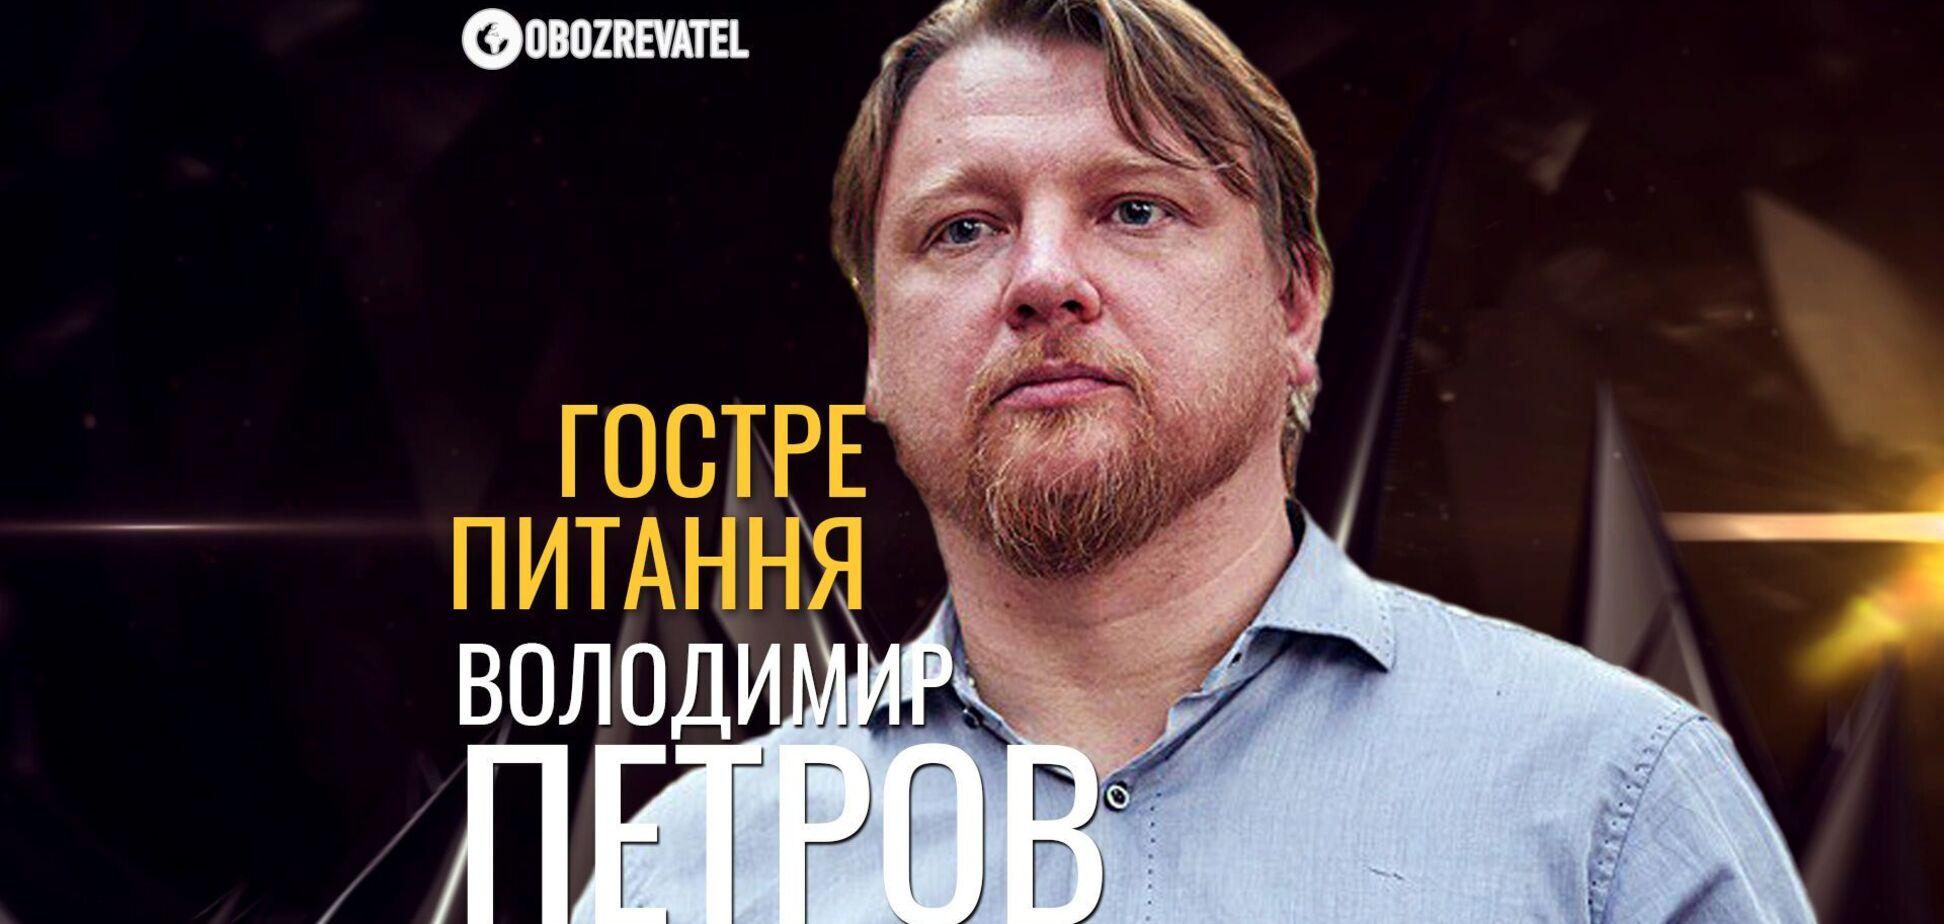 Володимир Петров 📍 Гостре питання